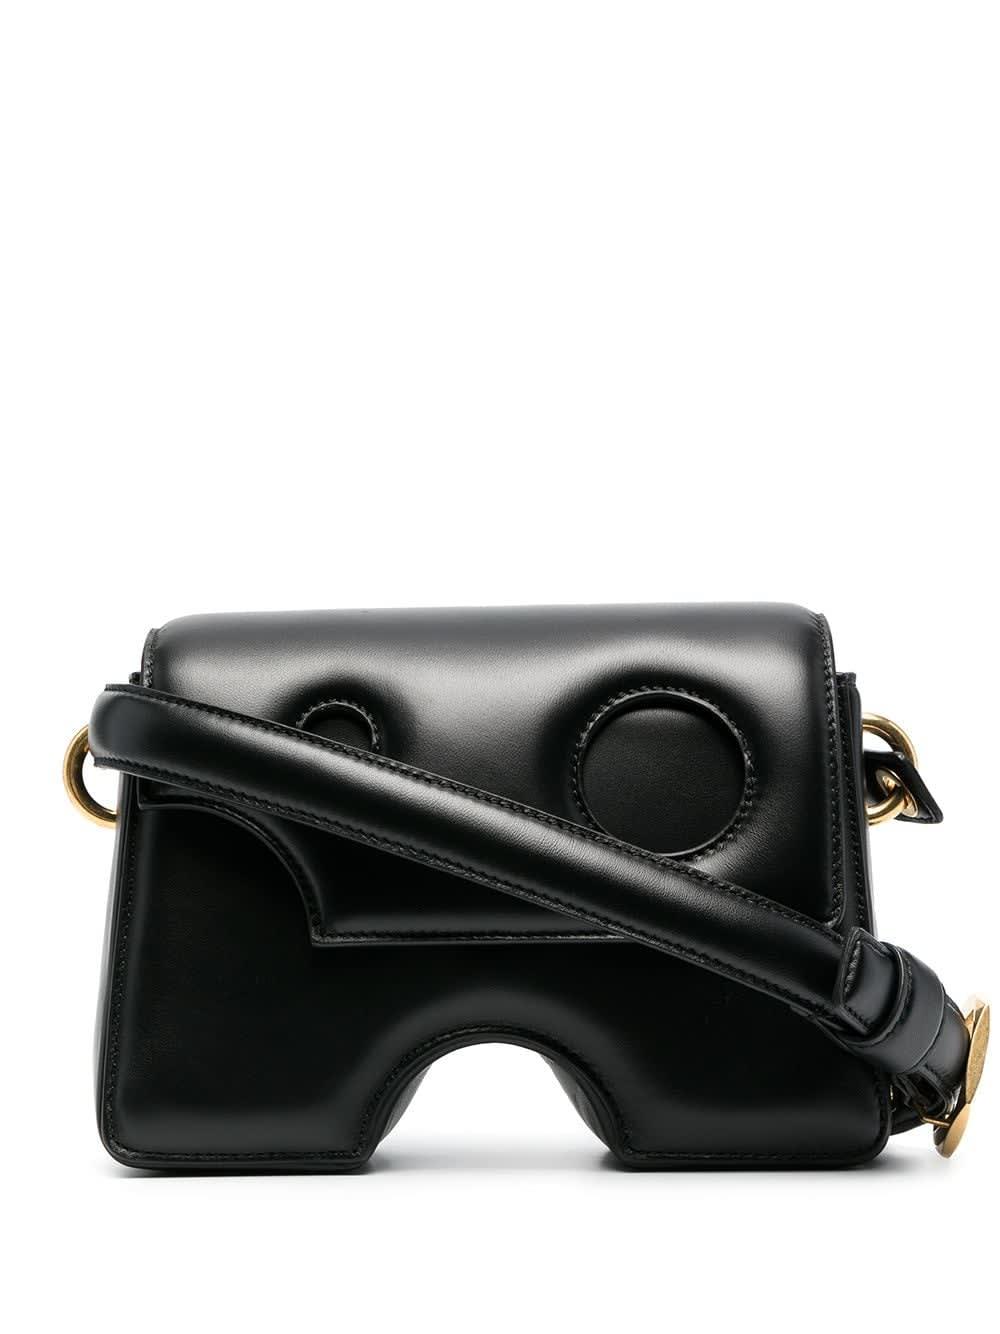 Off-White Leathers BLACK BURROW-22 SHOULDER BAG